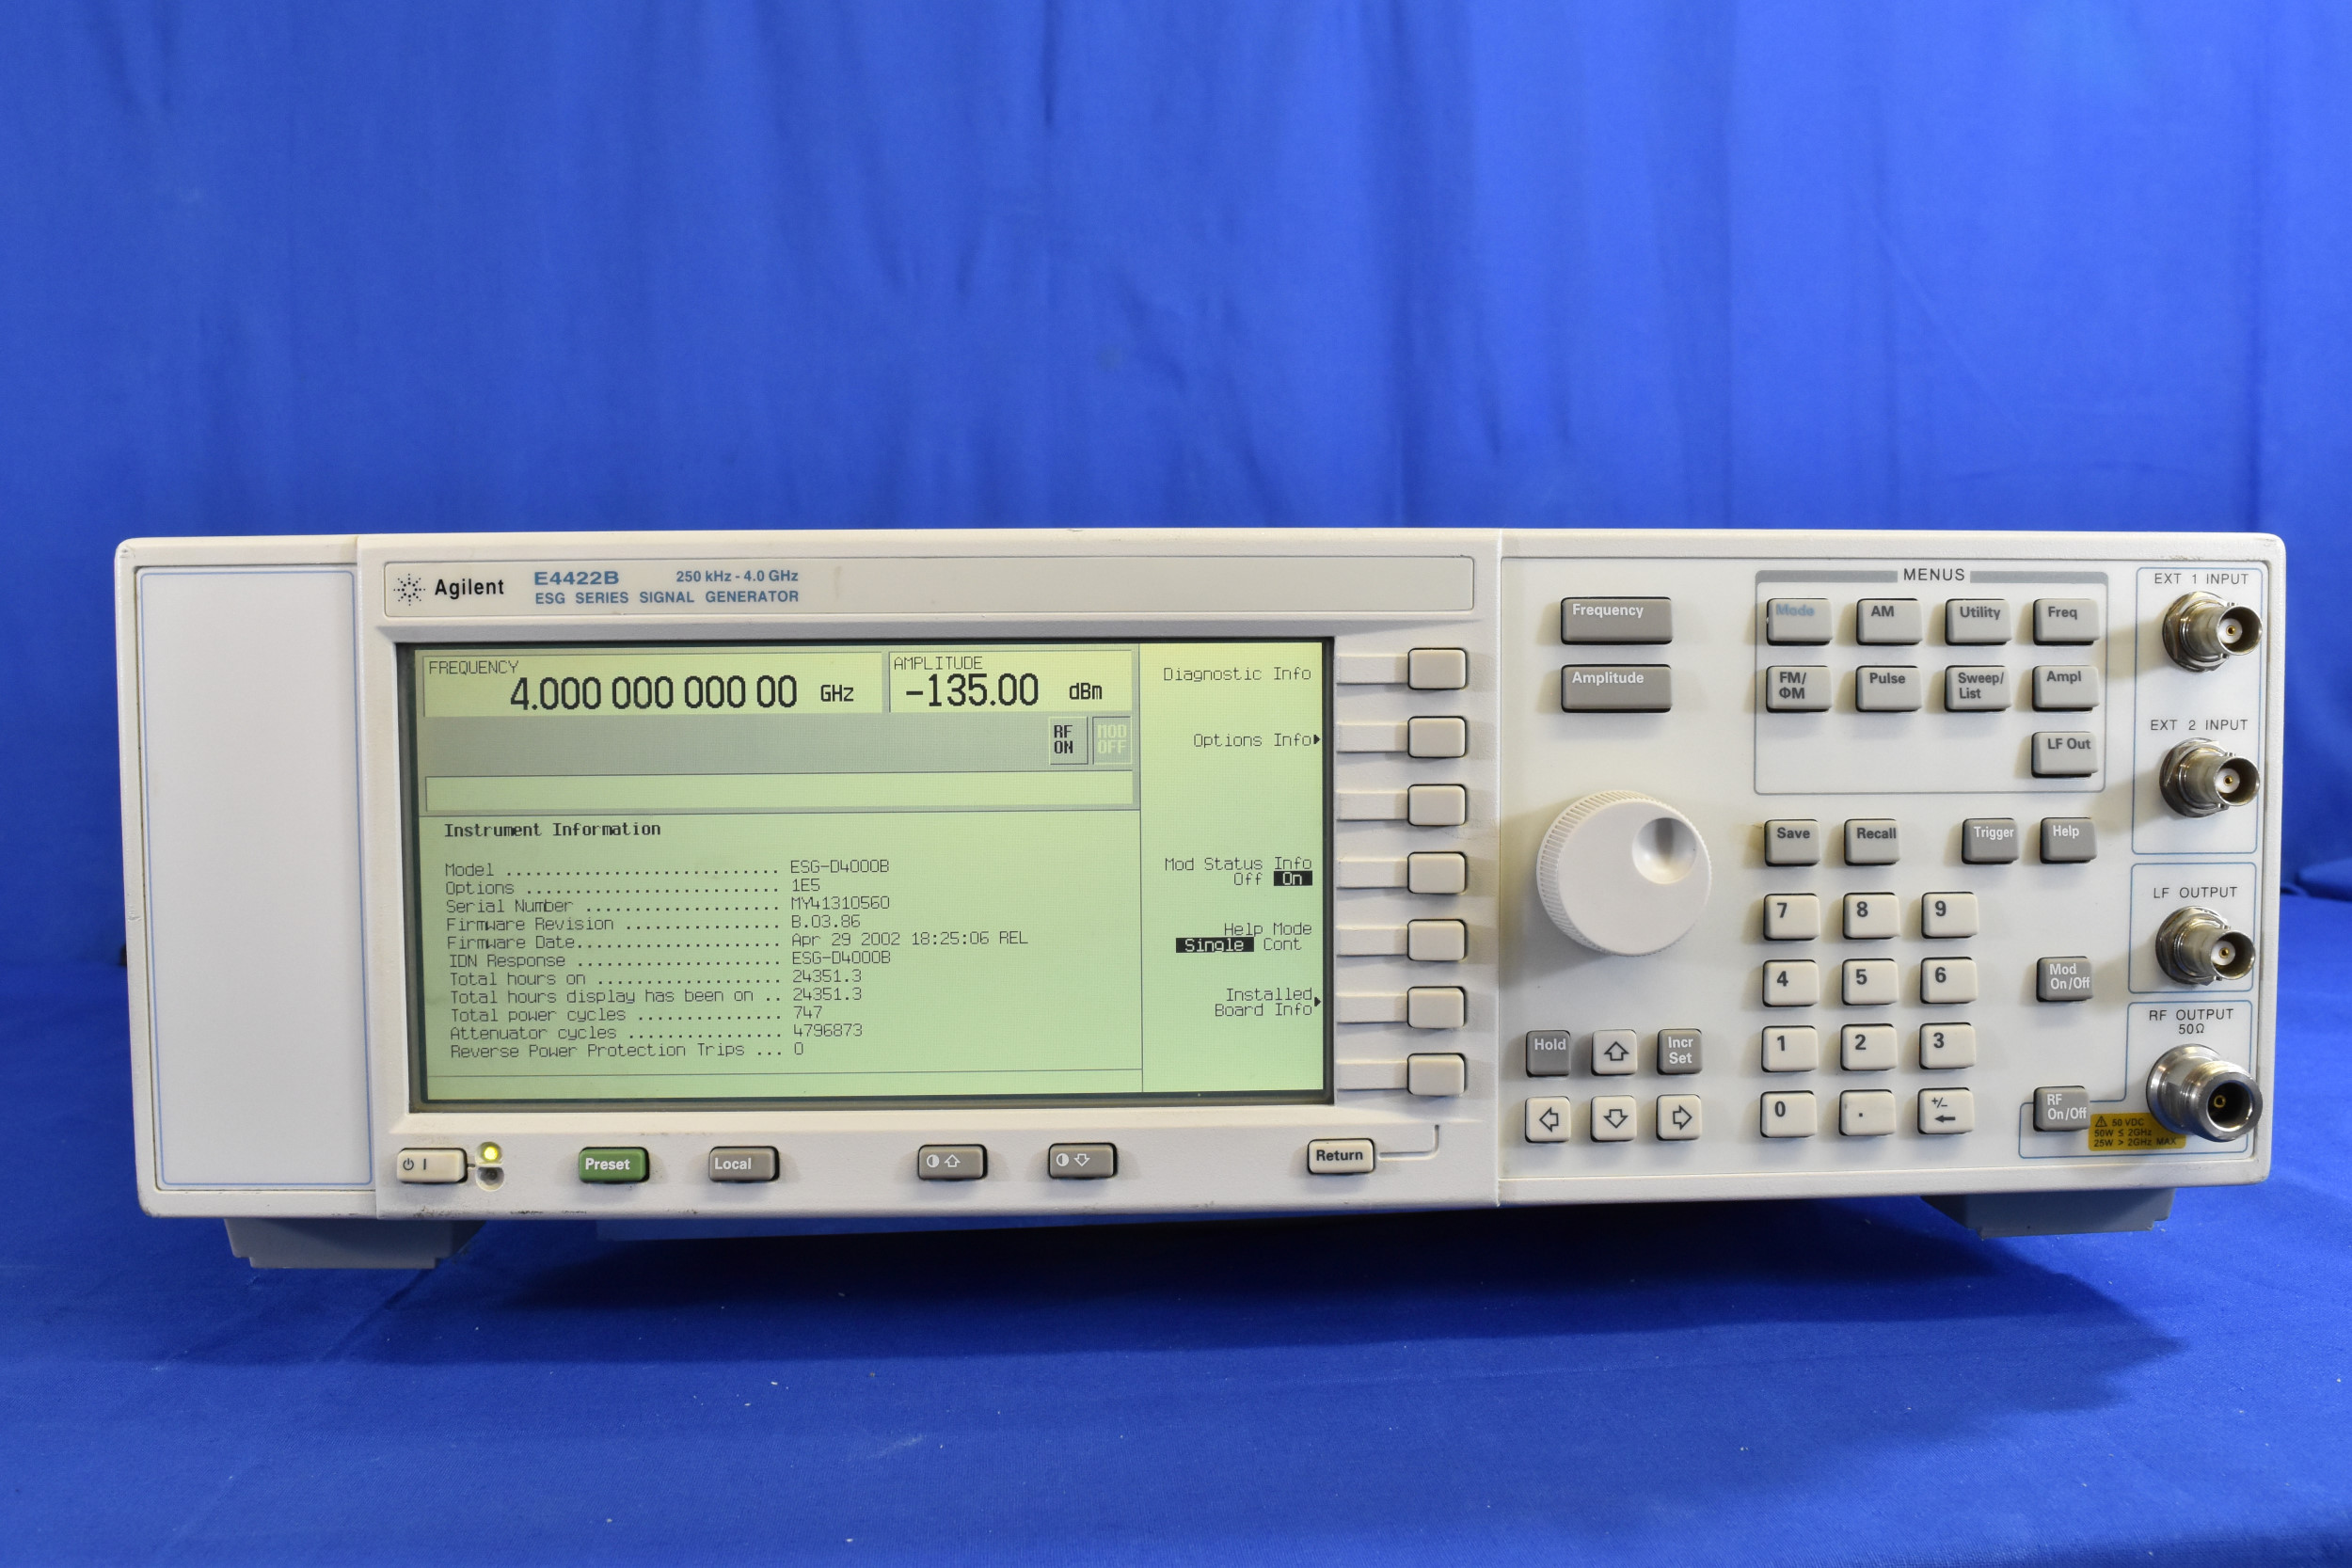 SN 987_001